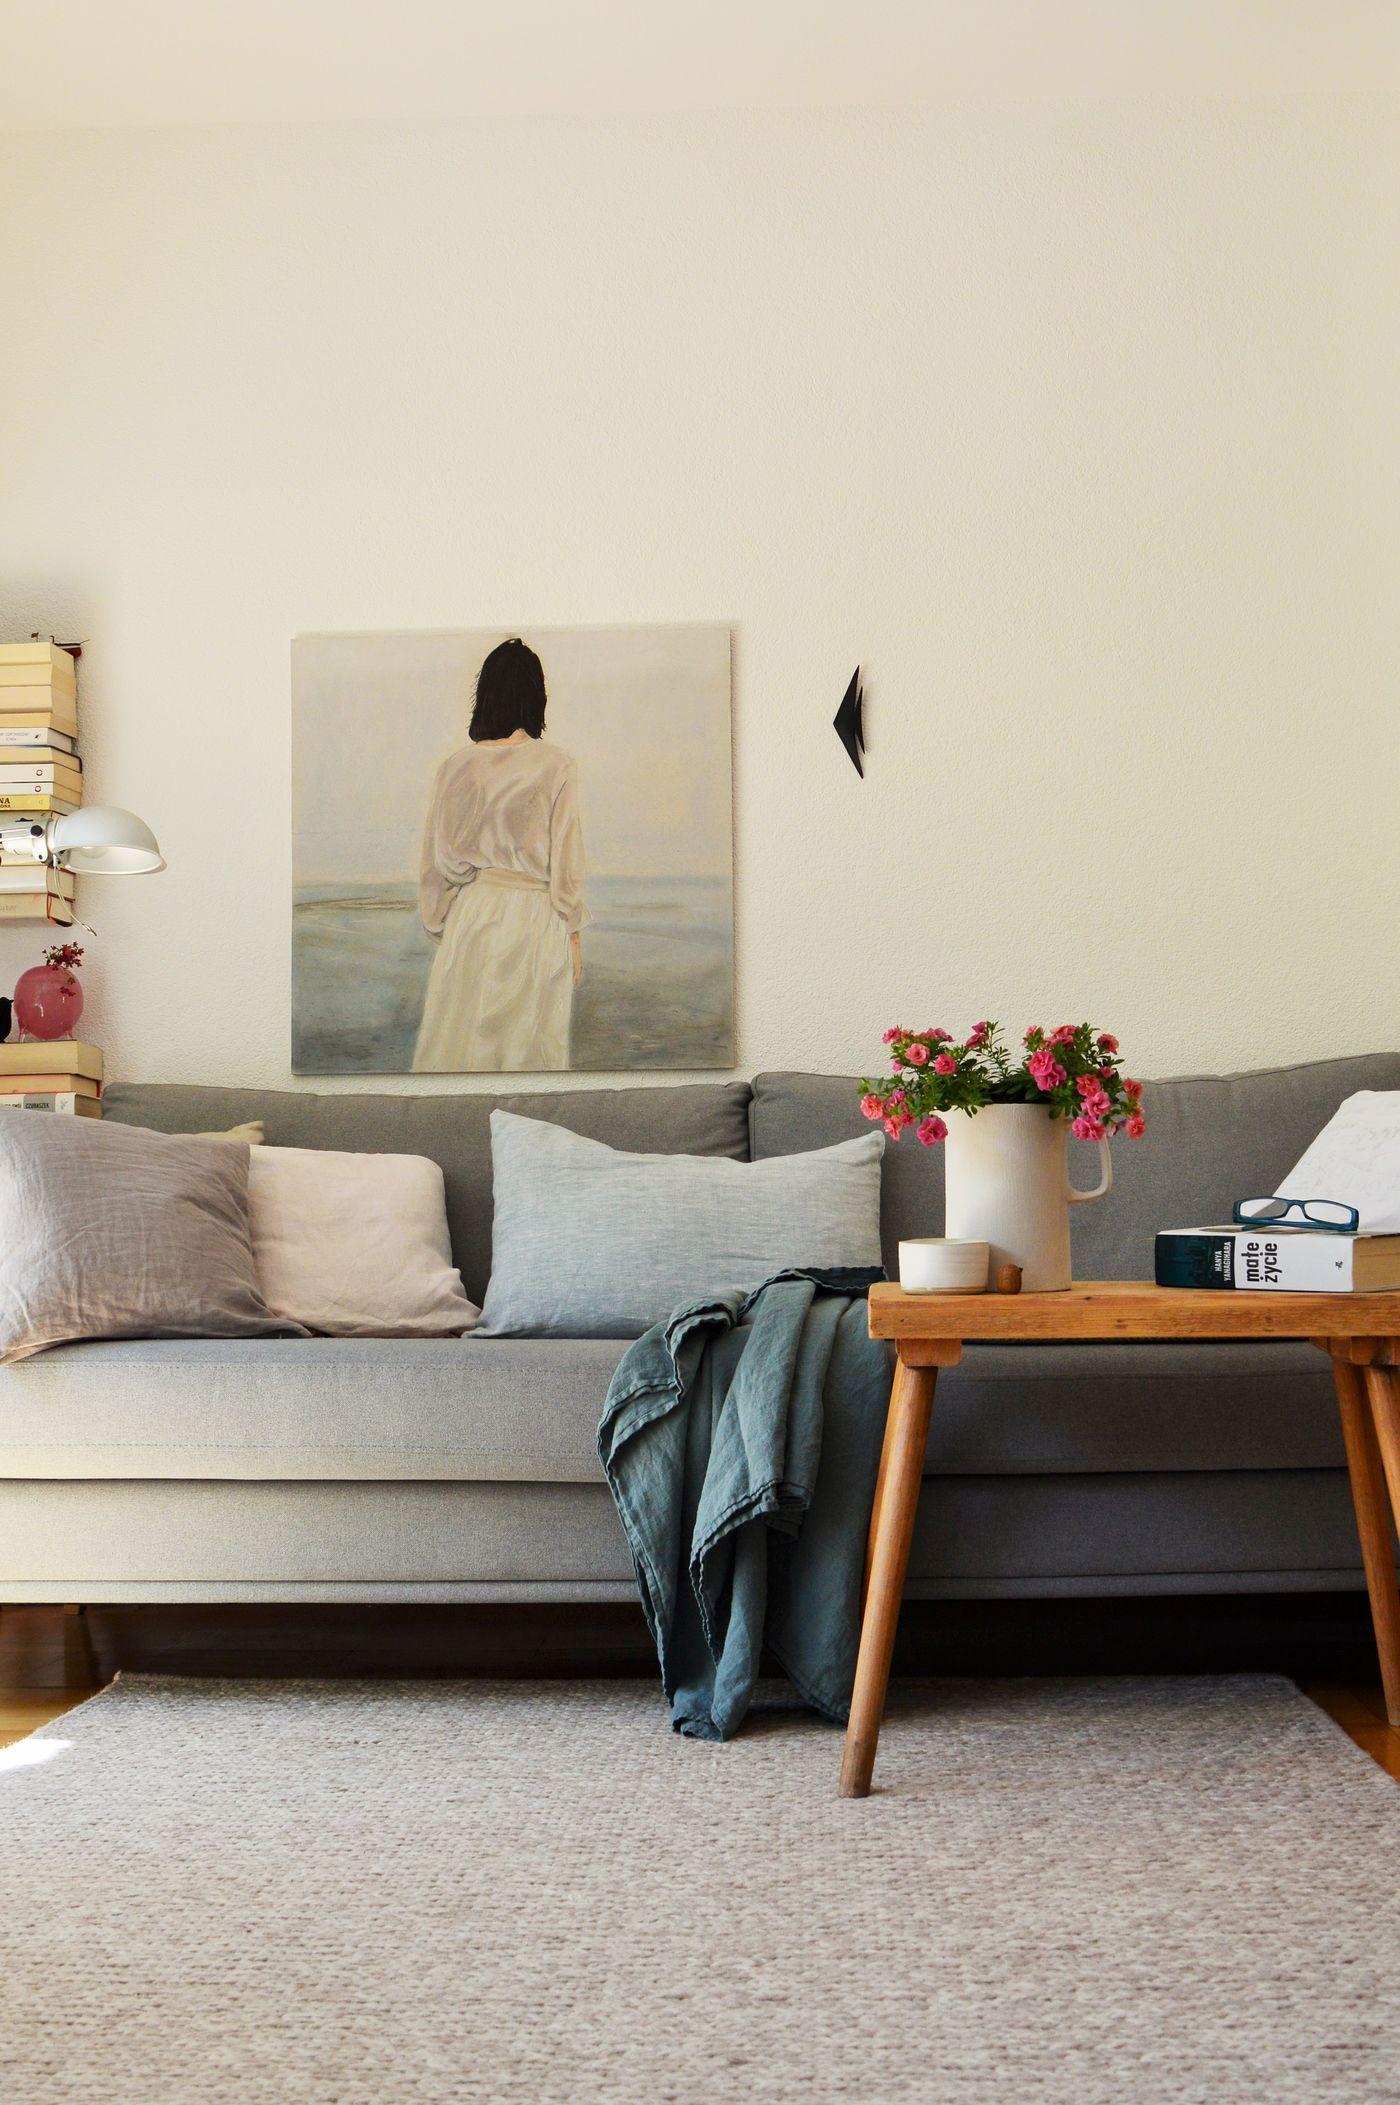 do it yourself ideen f r dein zuhause seite 2. Black Bedroom Furniture Sets. Home Design Ideas